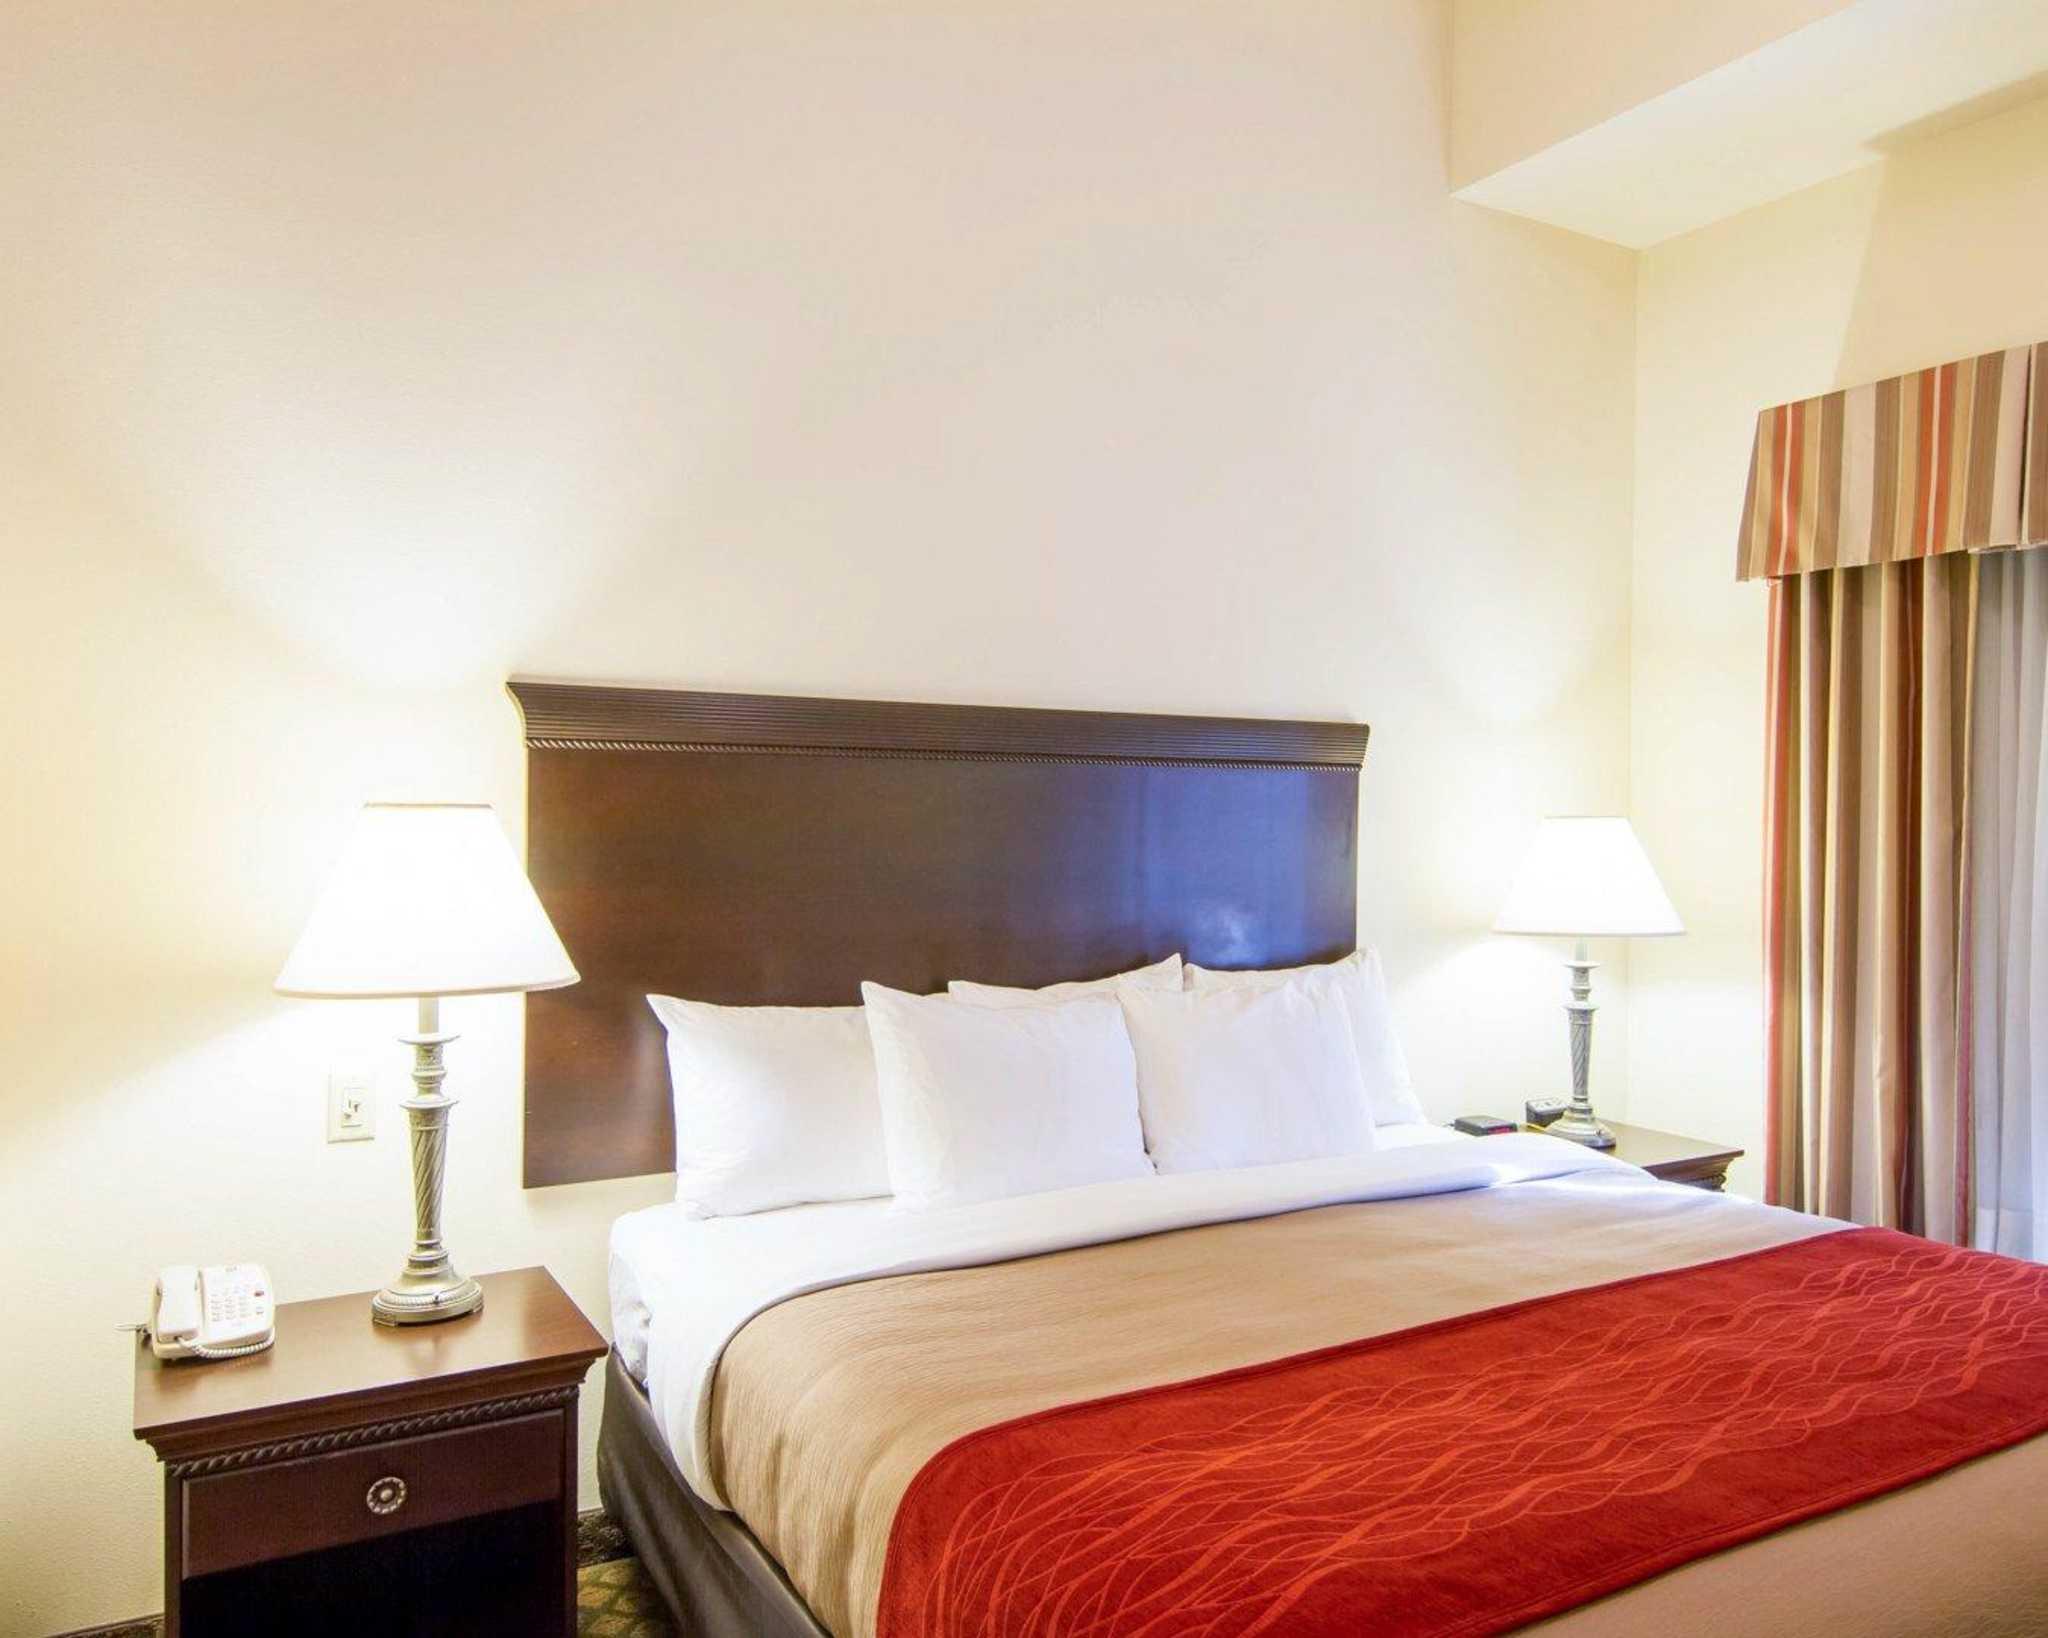 Comfort Inn & Suites Airport image 27